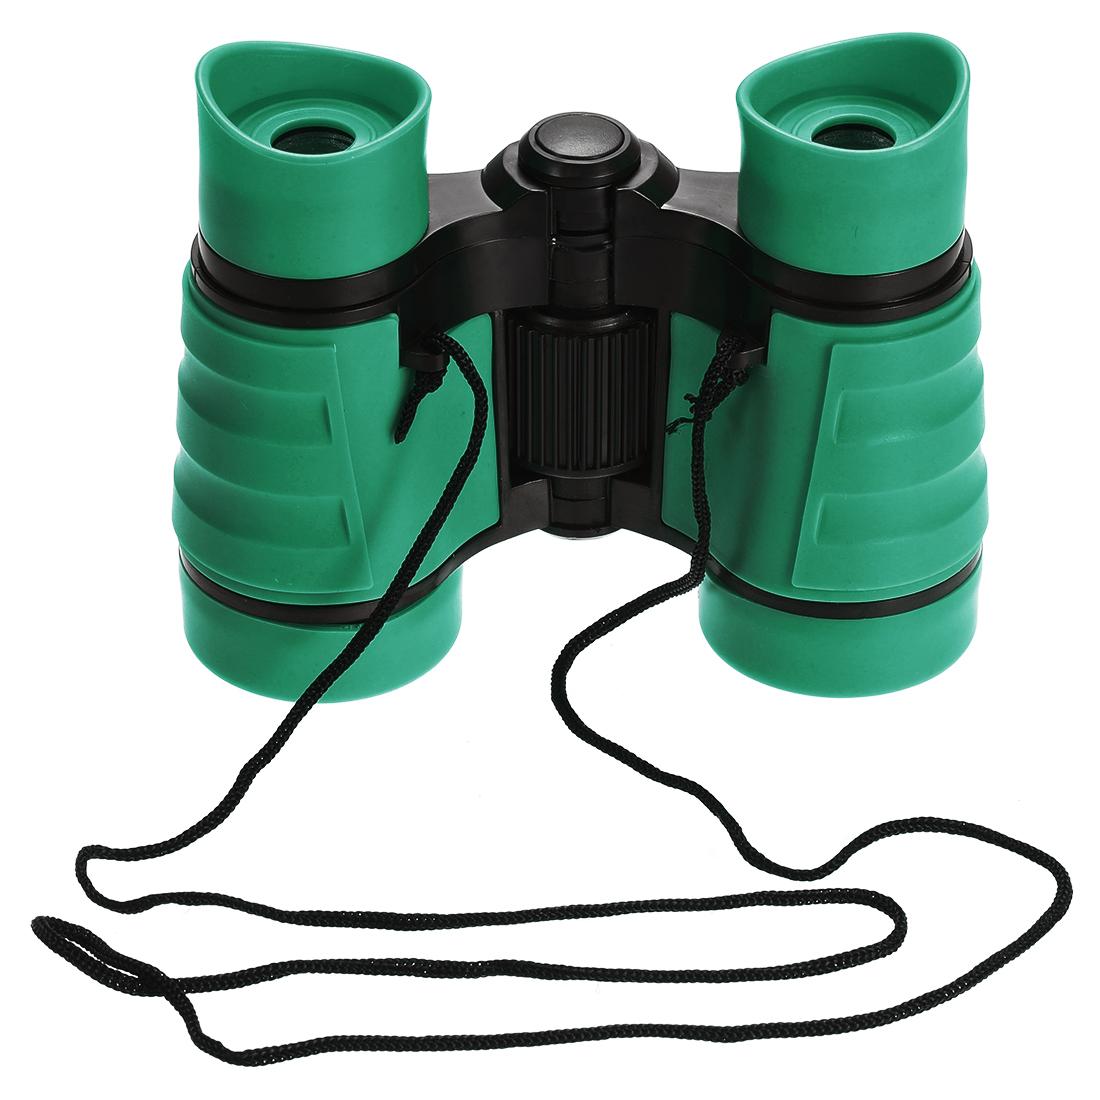 Toy Binoculars 4X30 Compact Foldable Binoculars Shockproof Green with Neck Strap